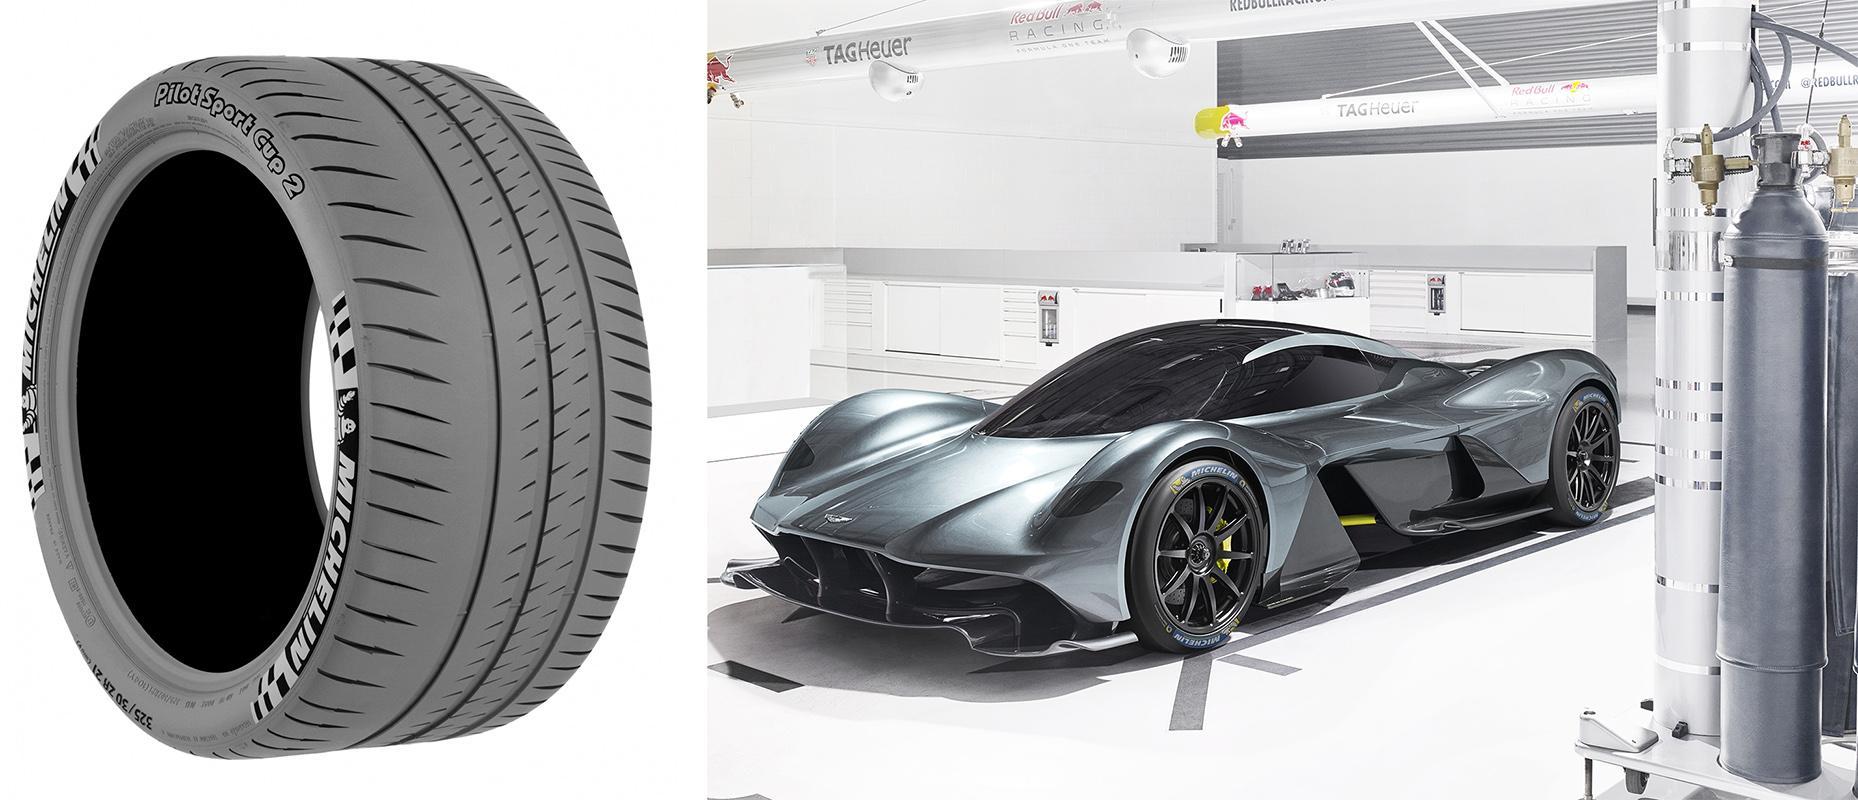 Мишленовцы обуют новый гиперкар Aston Martin Valkyrie